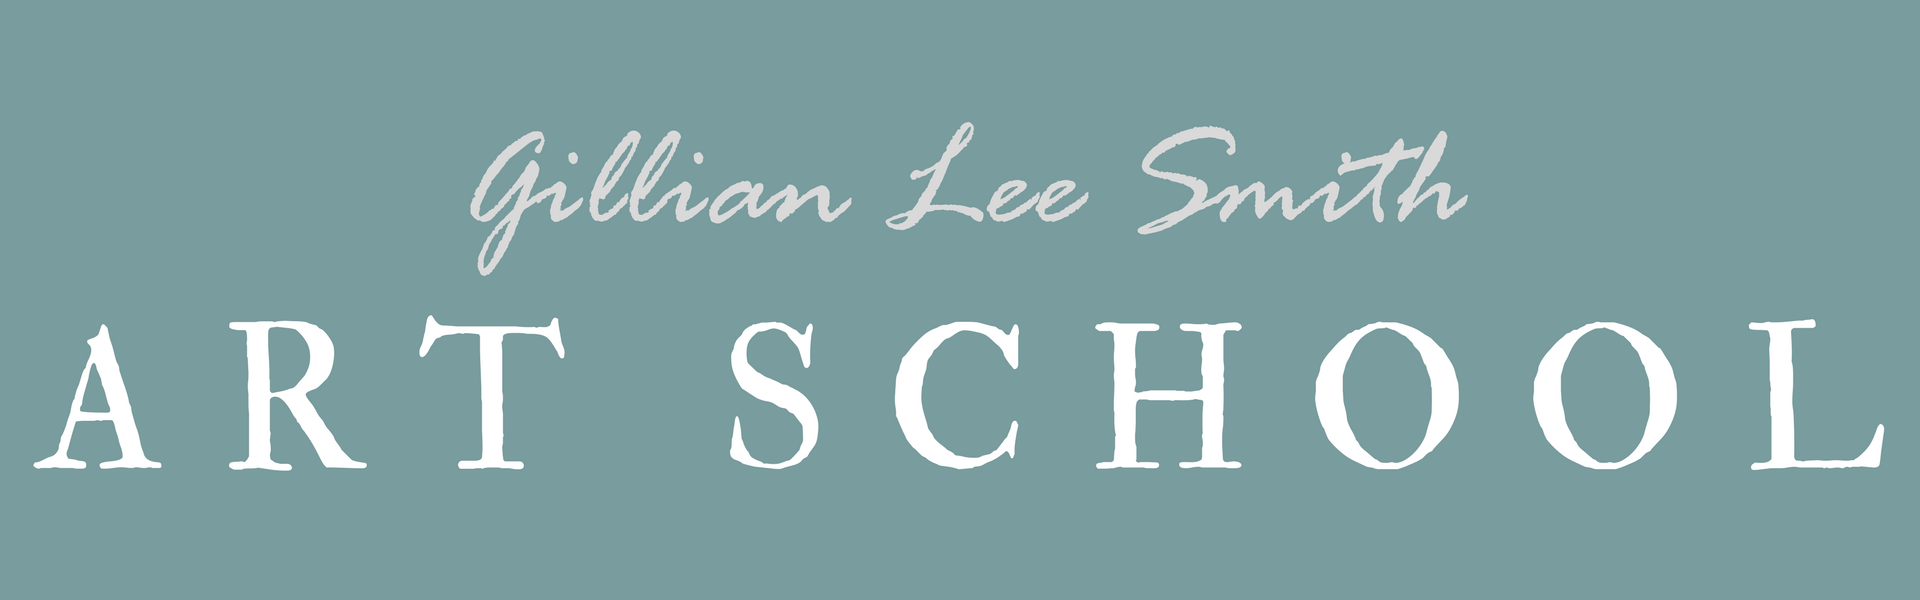 Gillian Lee Smith Art School